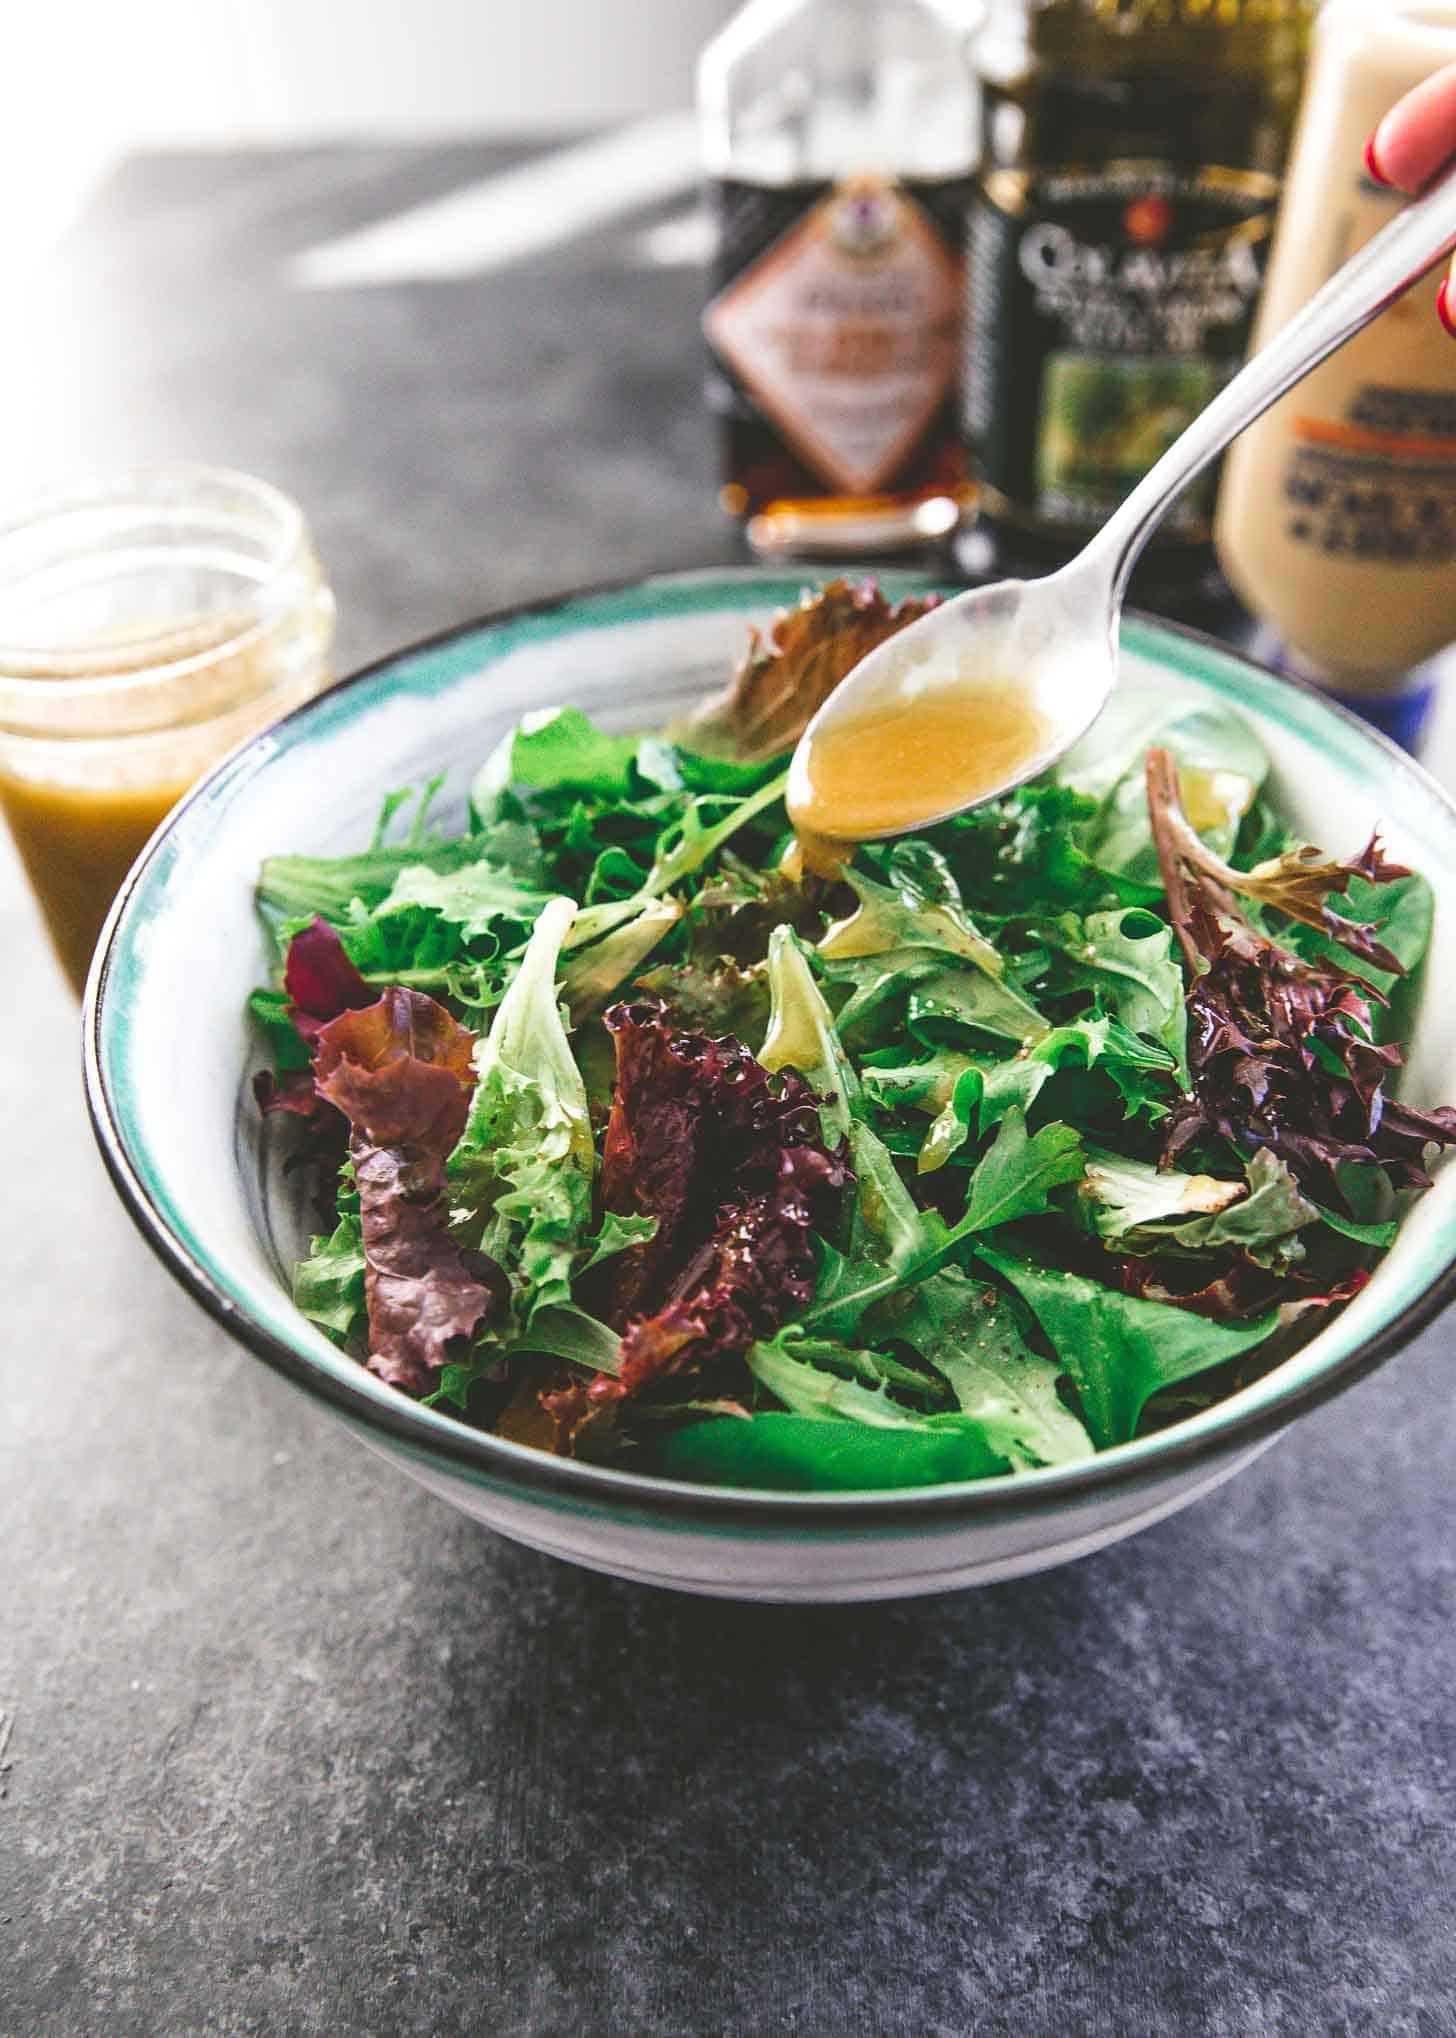 adding homemade vinaigrette to a salad